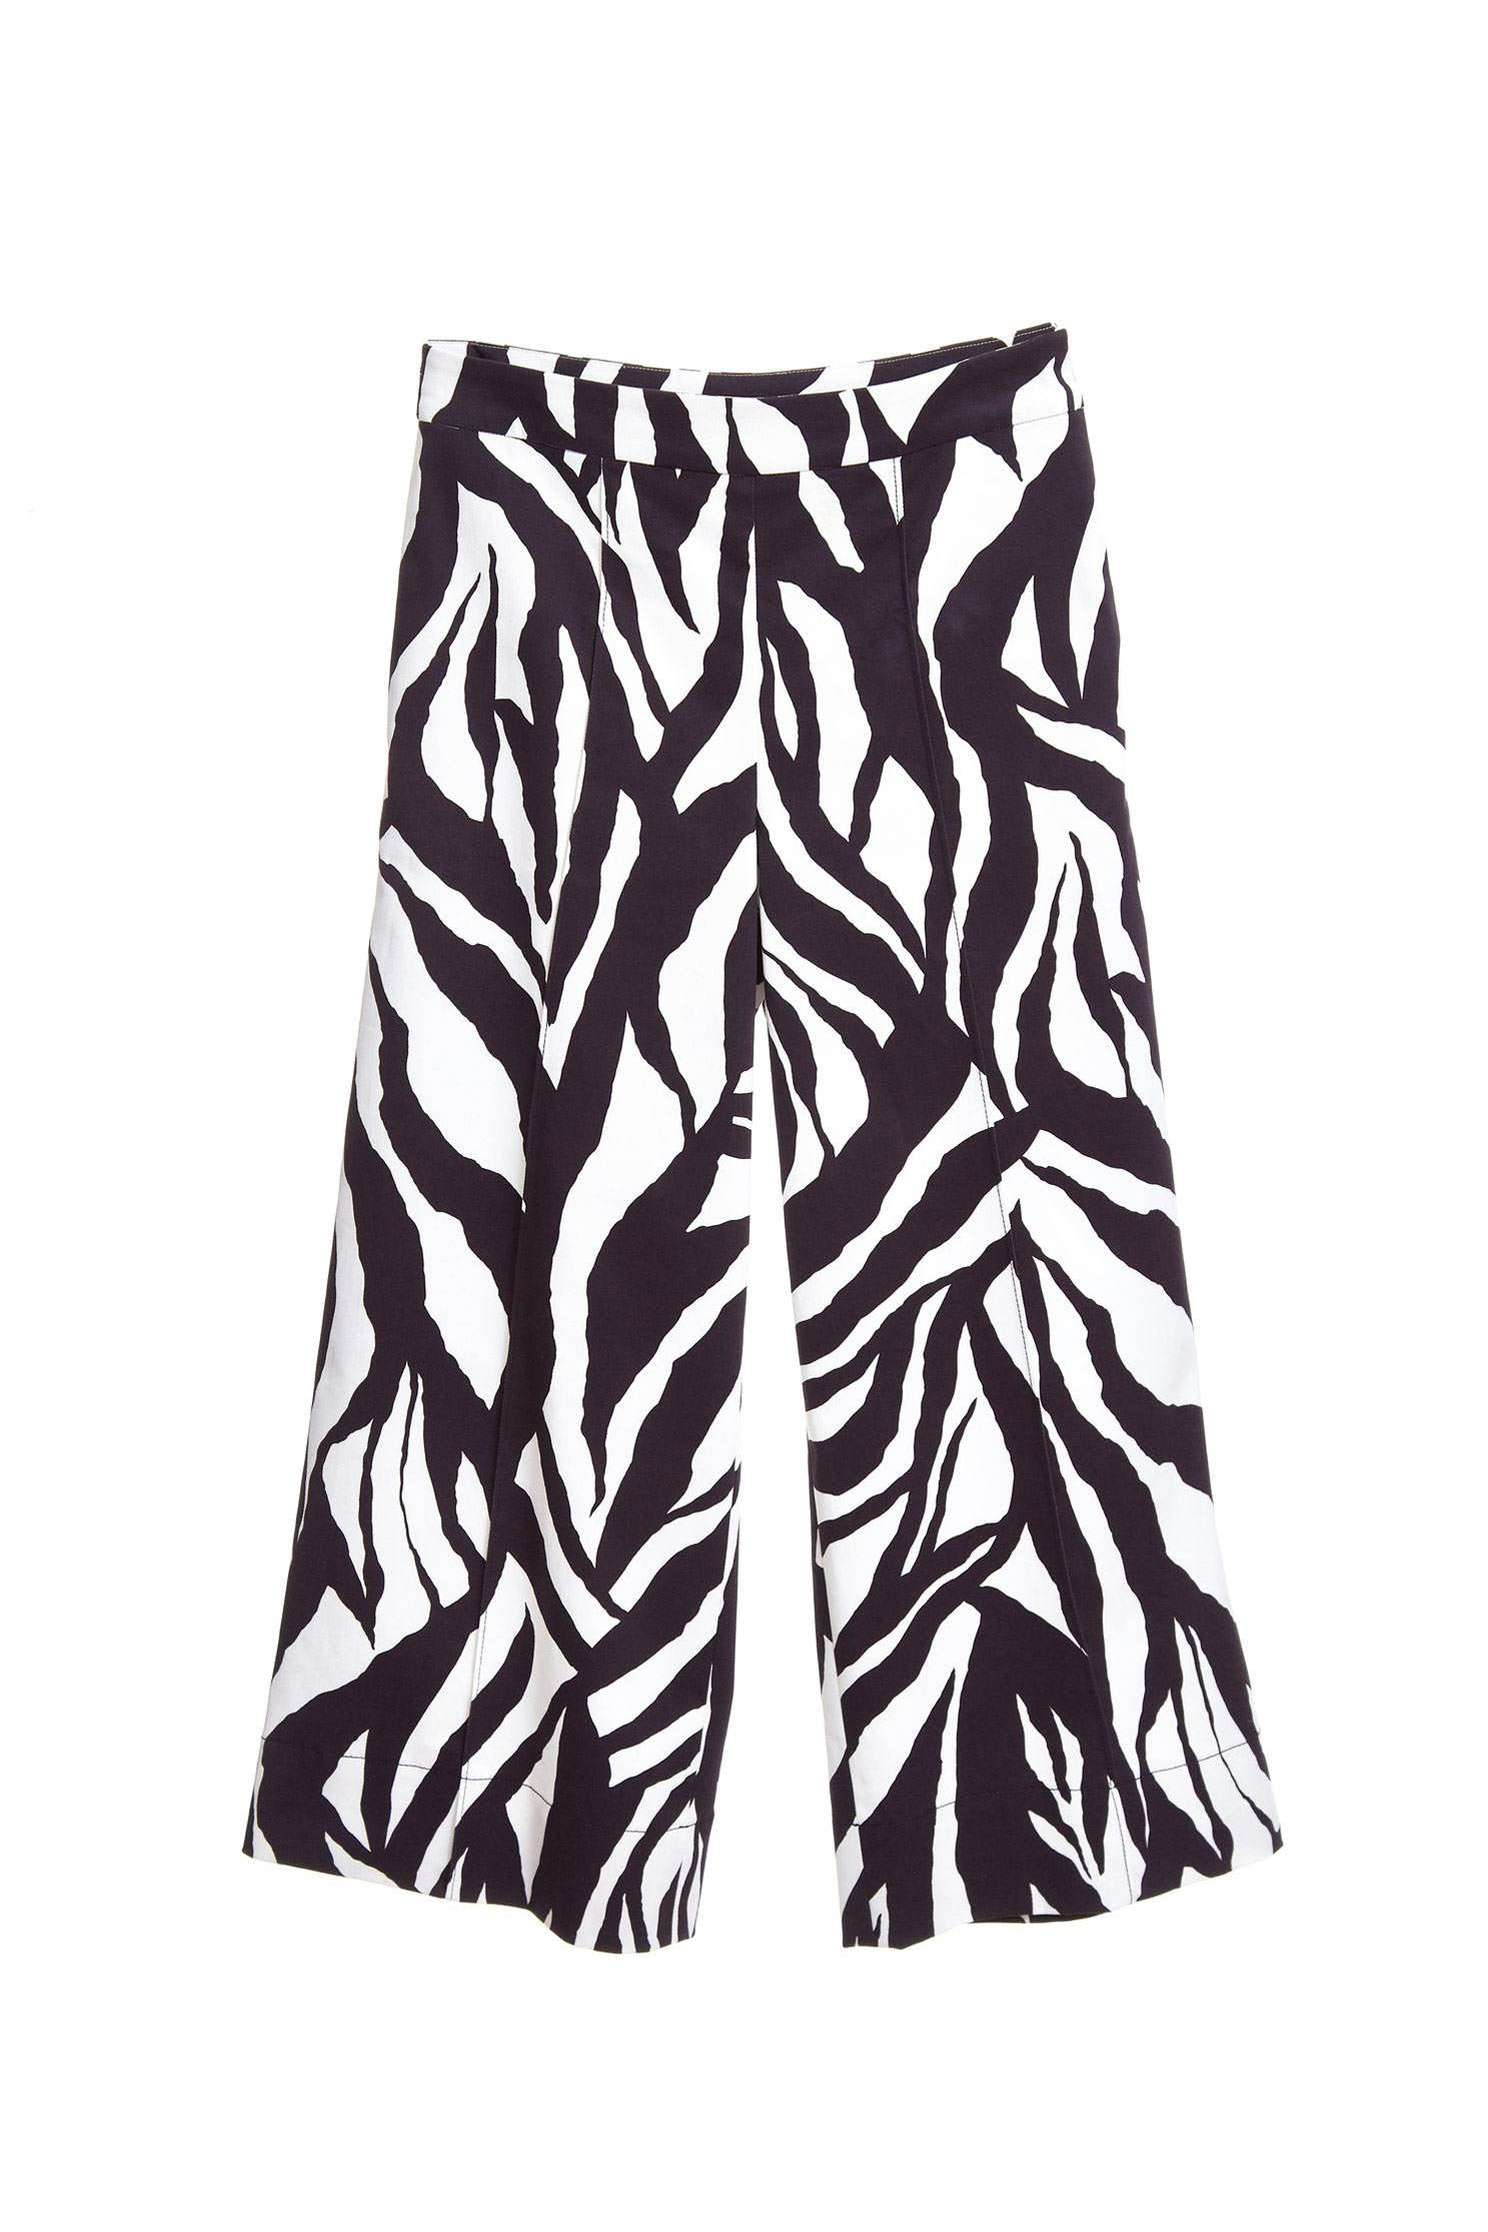 Zebra stripe classic fashion culottes